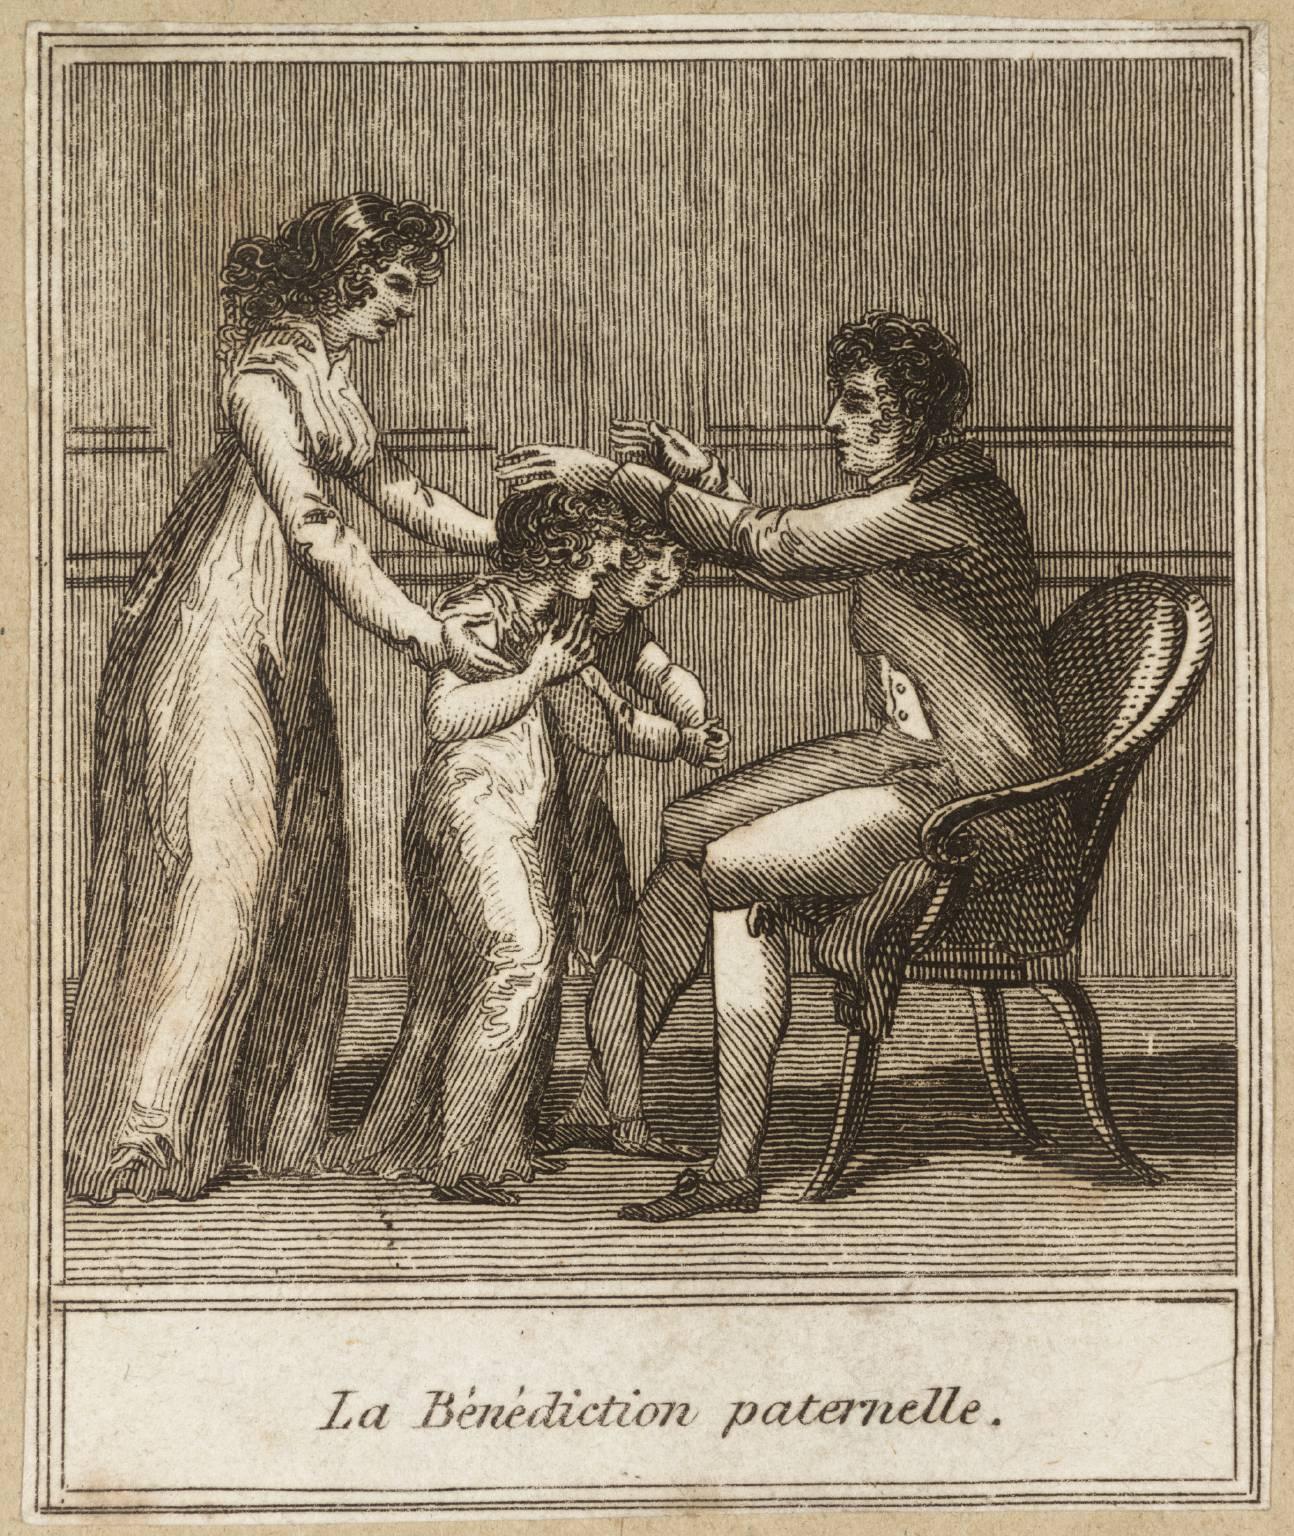 La bénédiction Artiste inconnu (Grande-Bretagne) Source : Tate Gallery